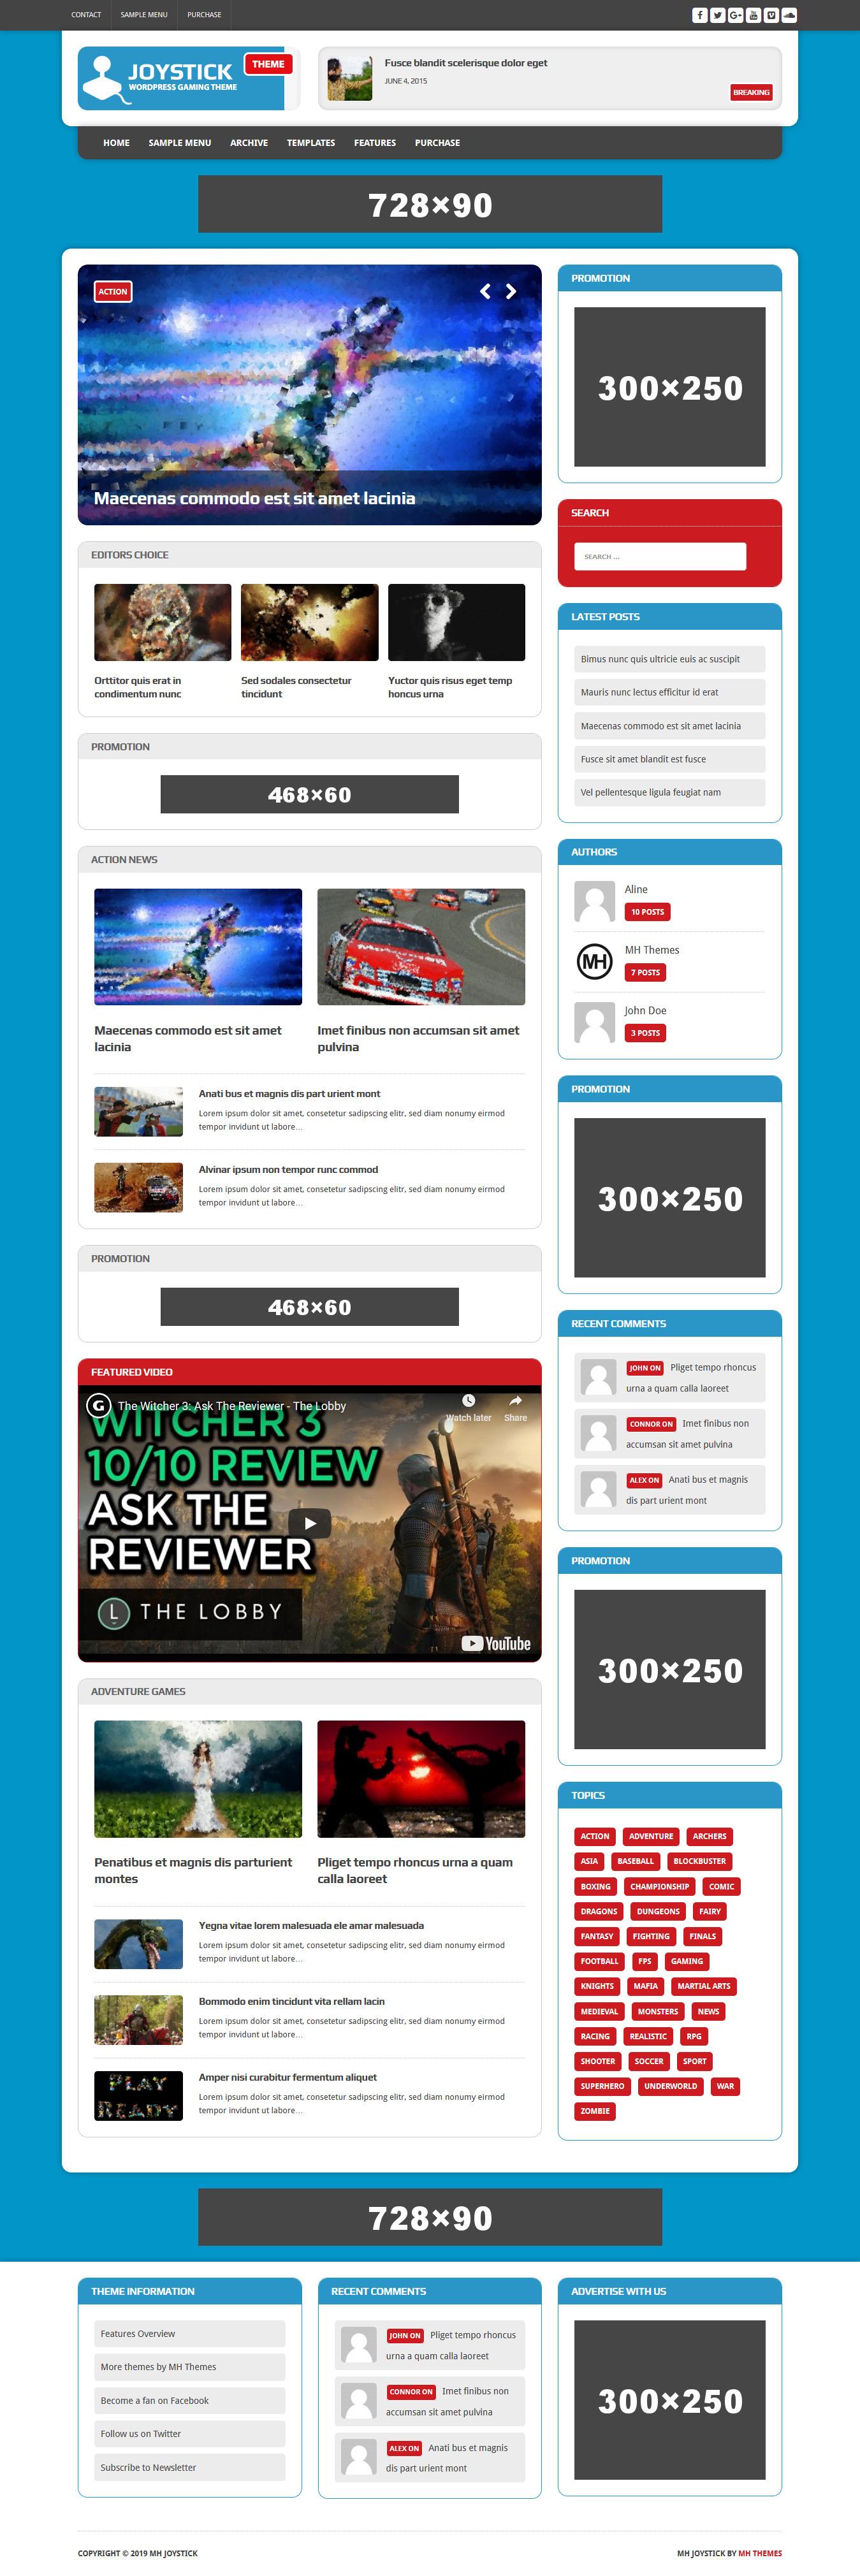 mh joystick lite best free gaming wordpress theme - 10+ Best Free Gaming WordPress Themes